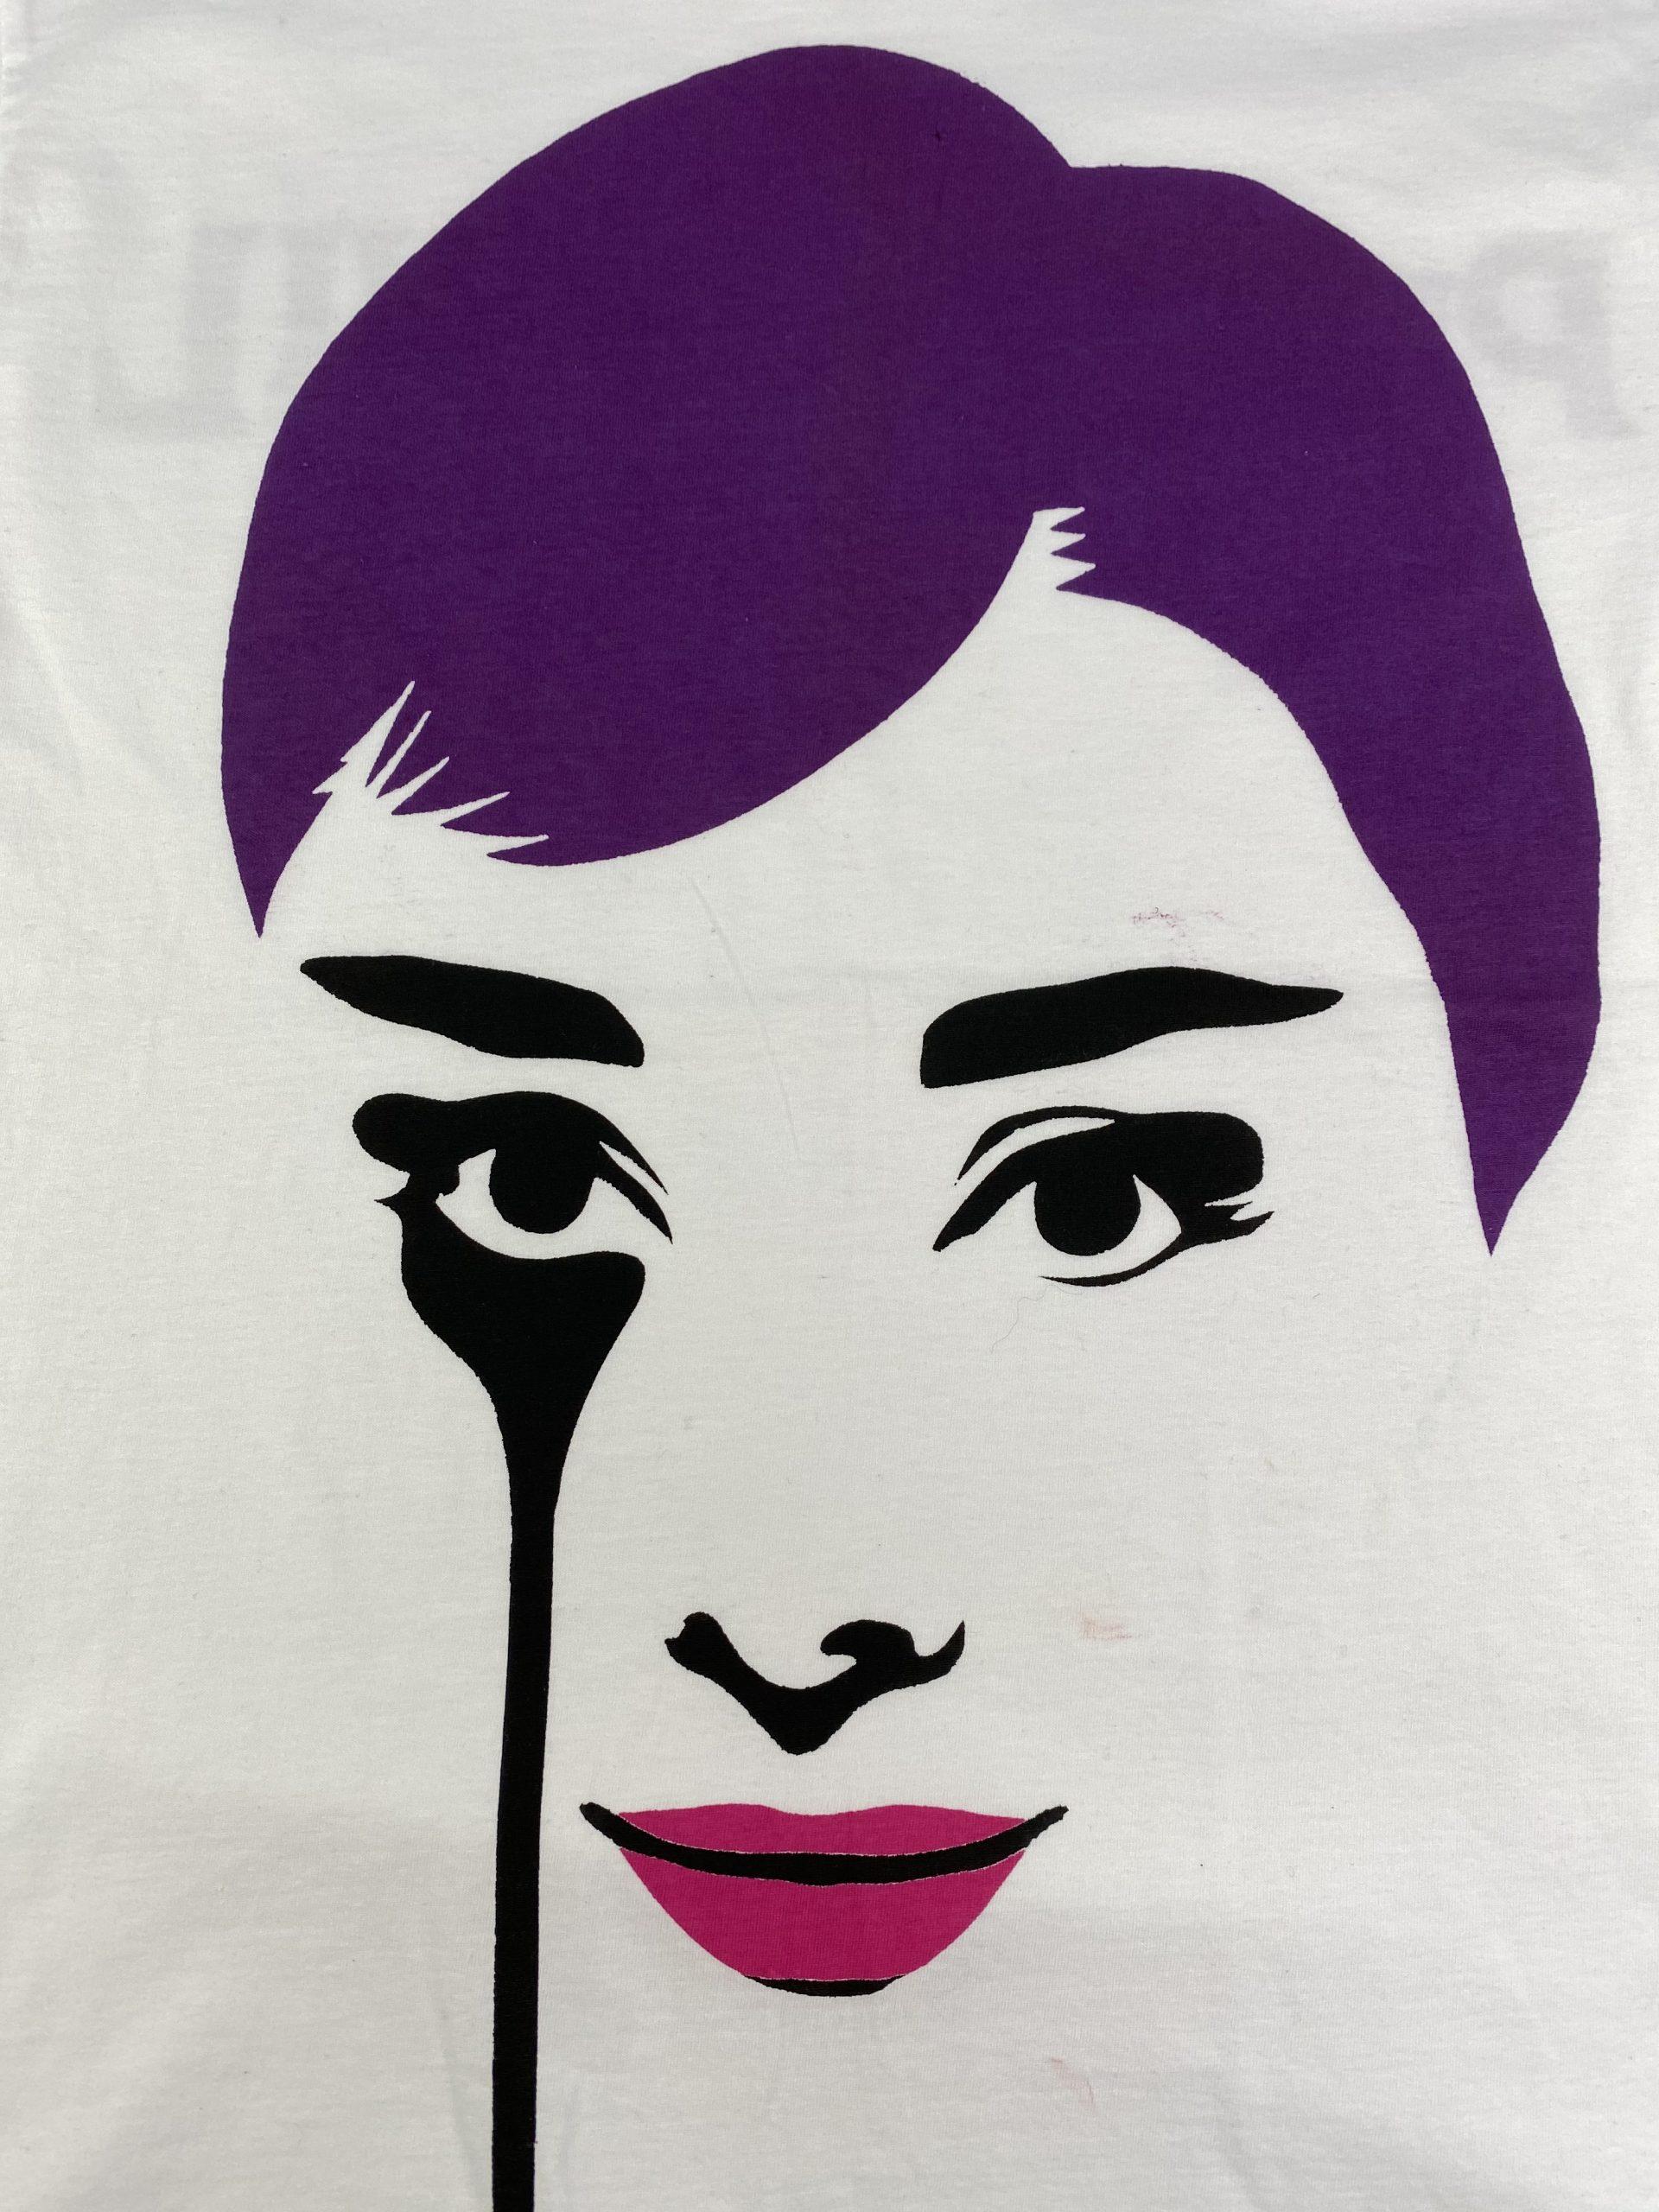 Saatchi Gallery Pure Evil t-shirt print on demand